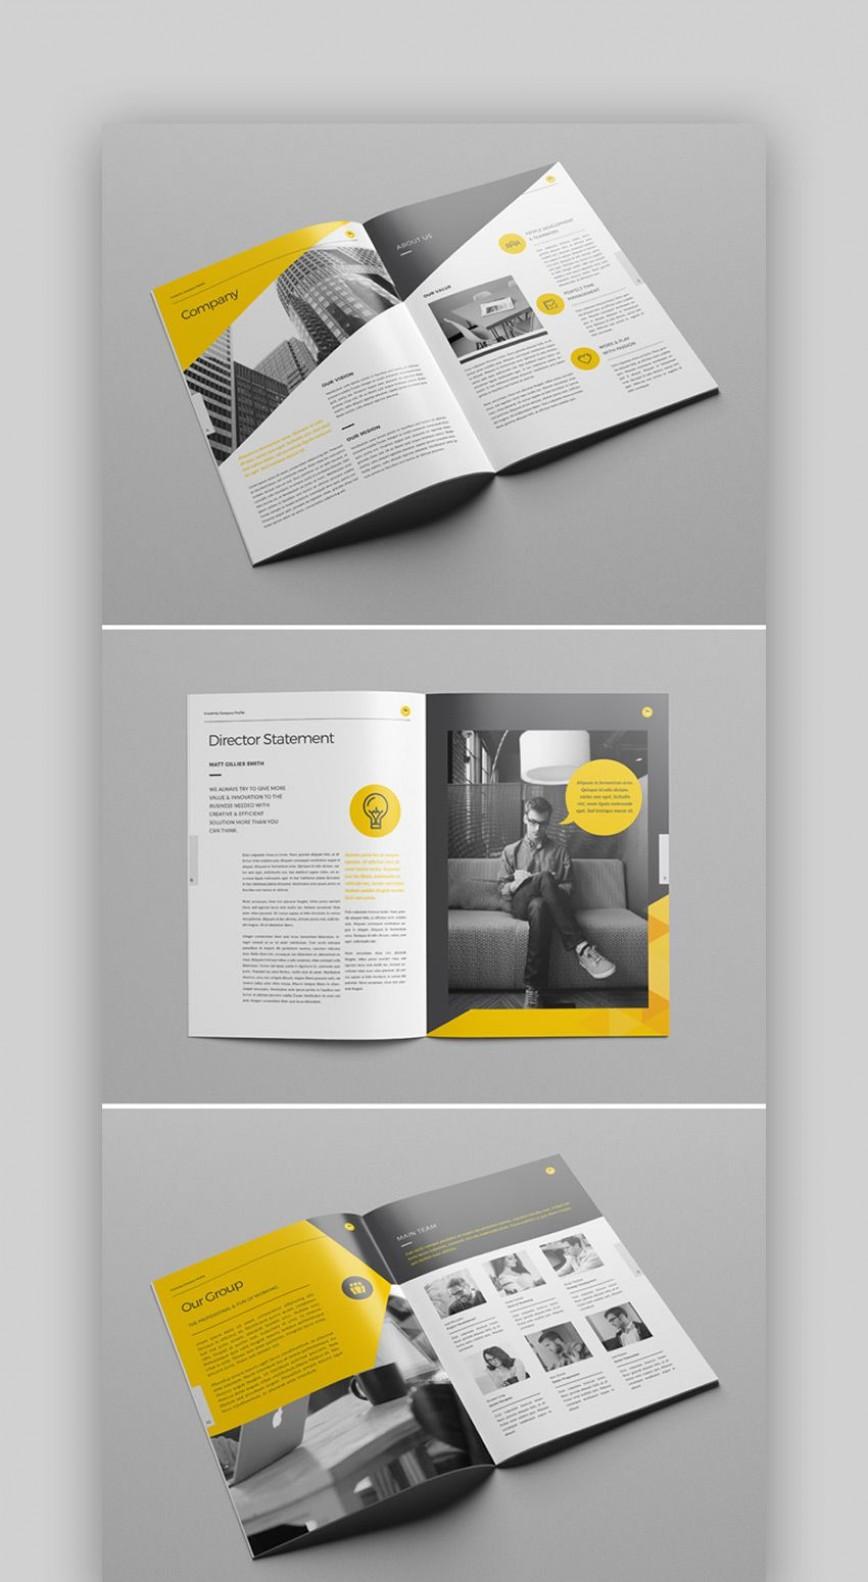 009 Imposing Adobe Indesign Brochure Template Free Download Design